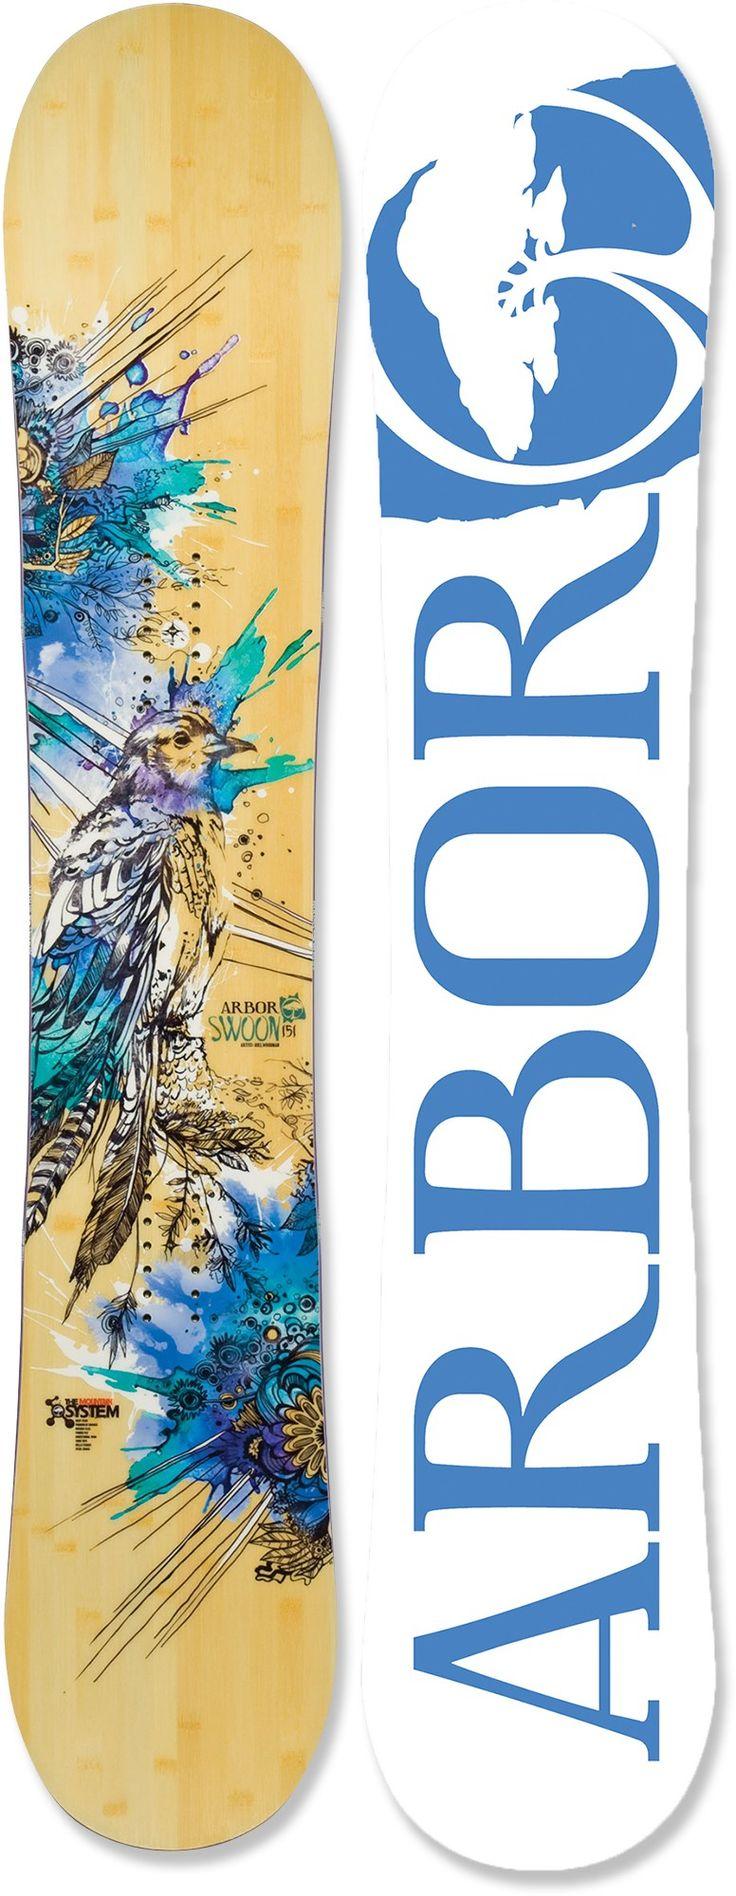 Arbor Swoon Snowboard $349, rocker, directional twin, Bamboo